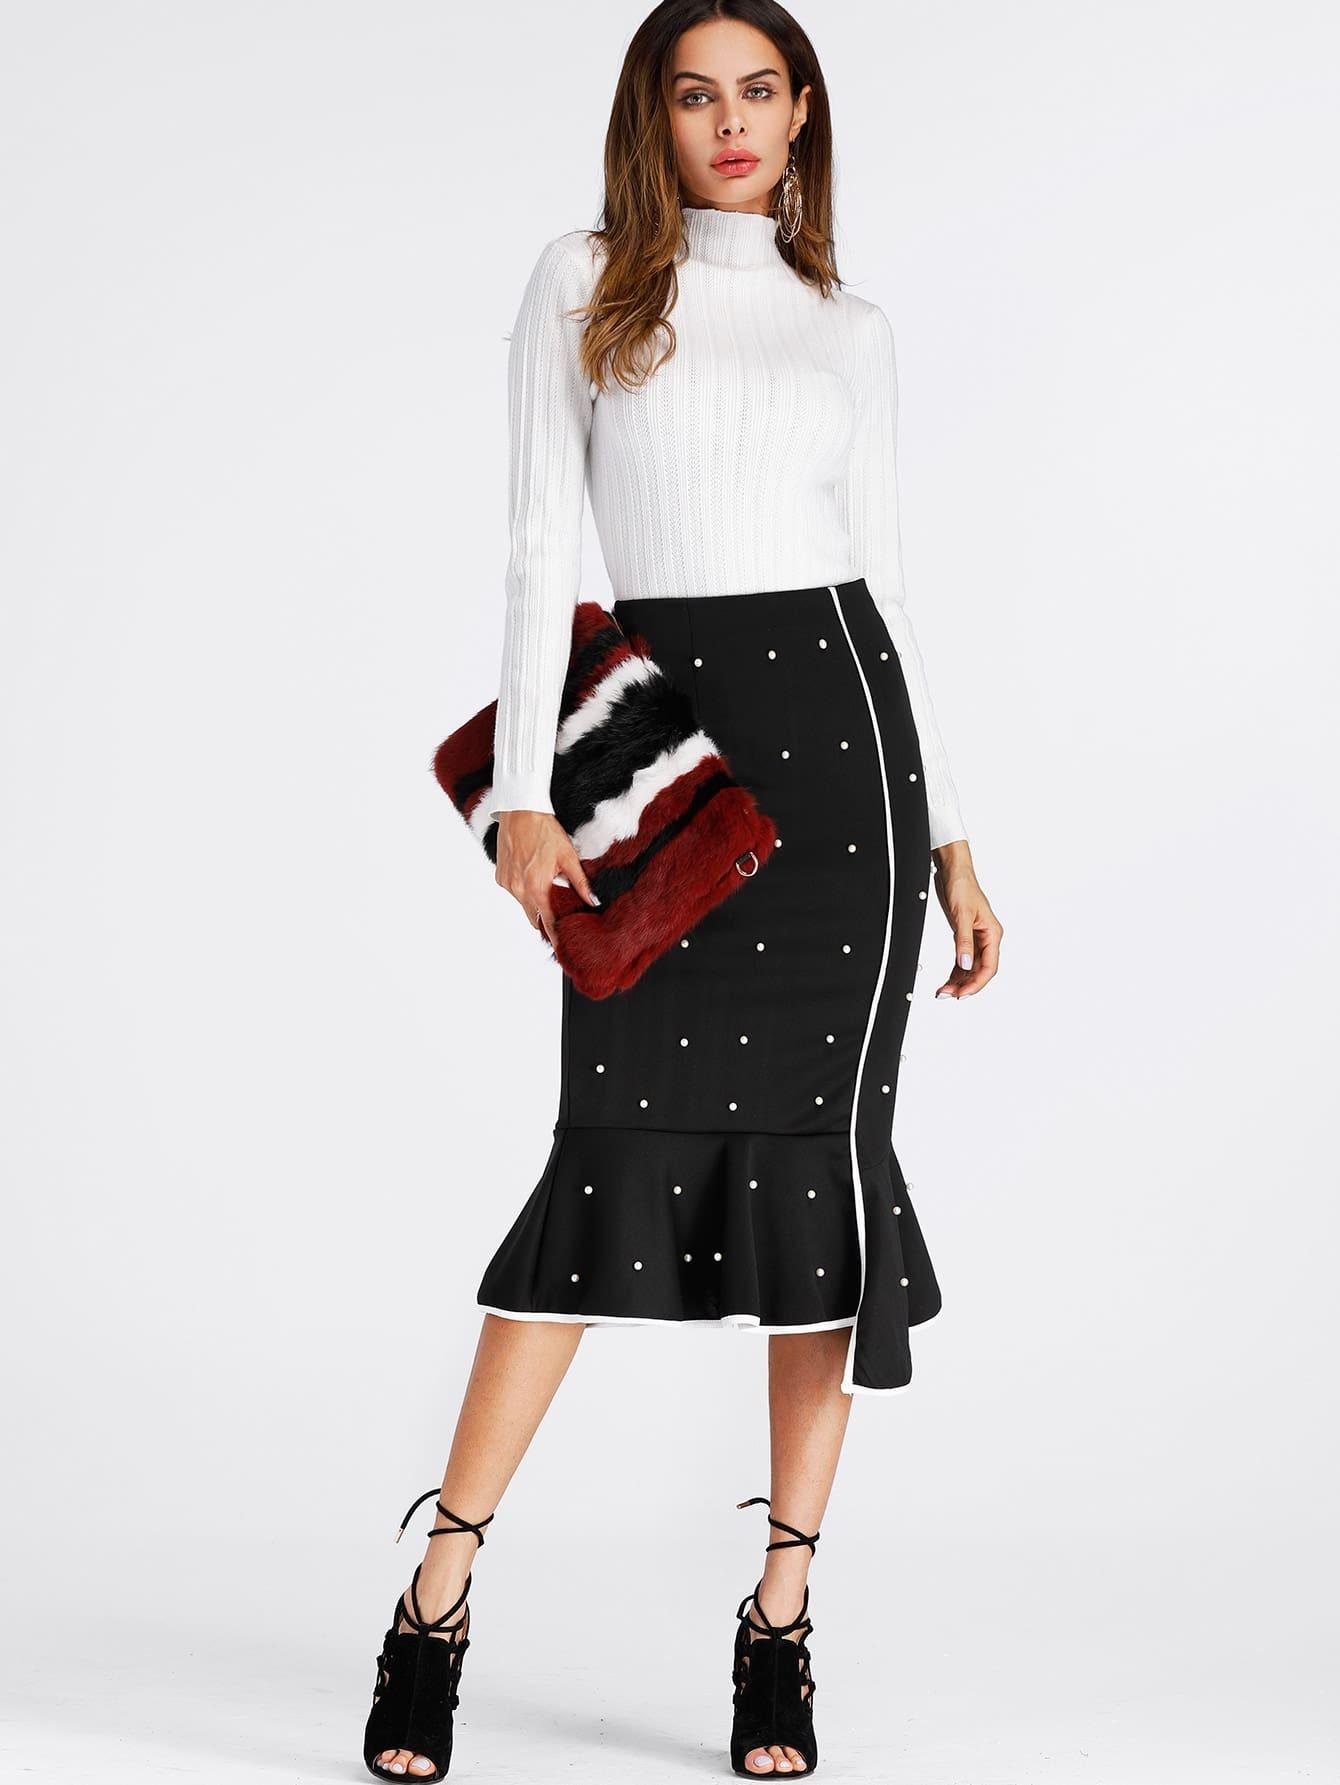 Pearl Beaded Frill Hem Ringer Skirt jeunesse luminesce daily moisturizing complex new free u s ship